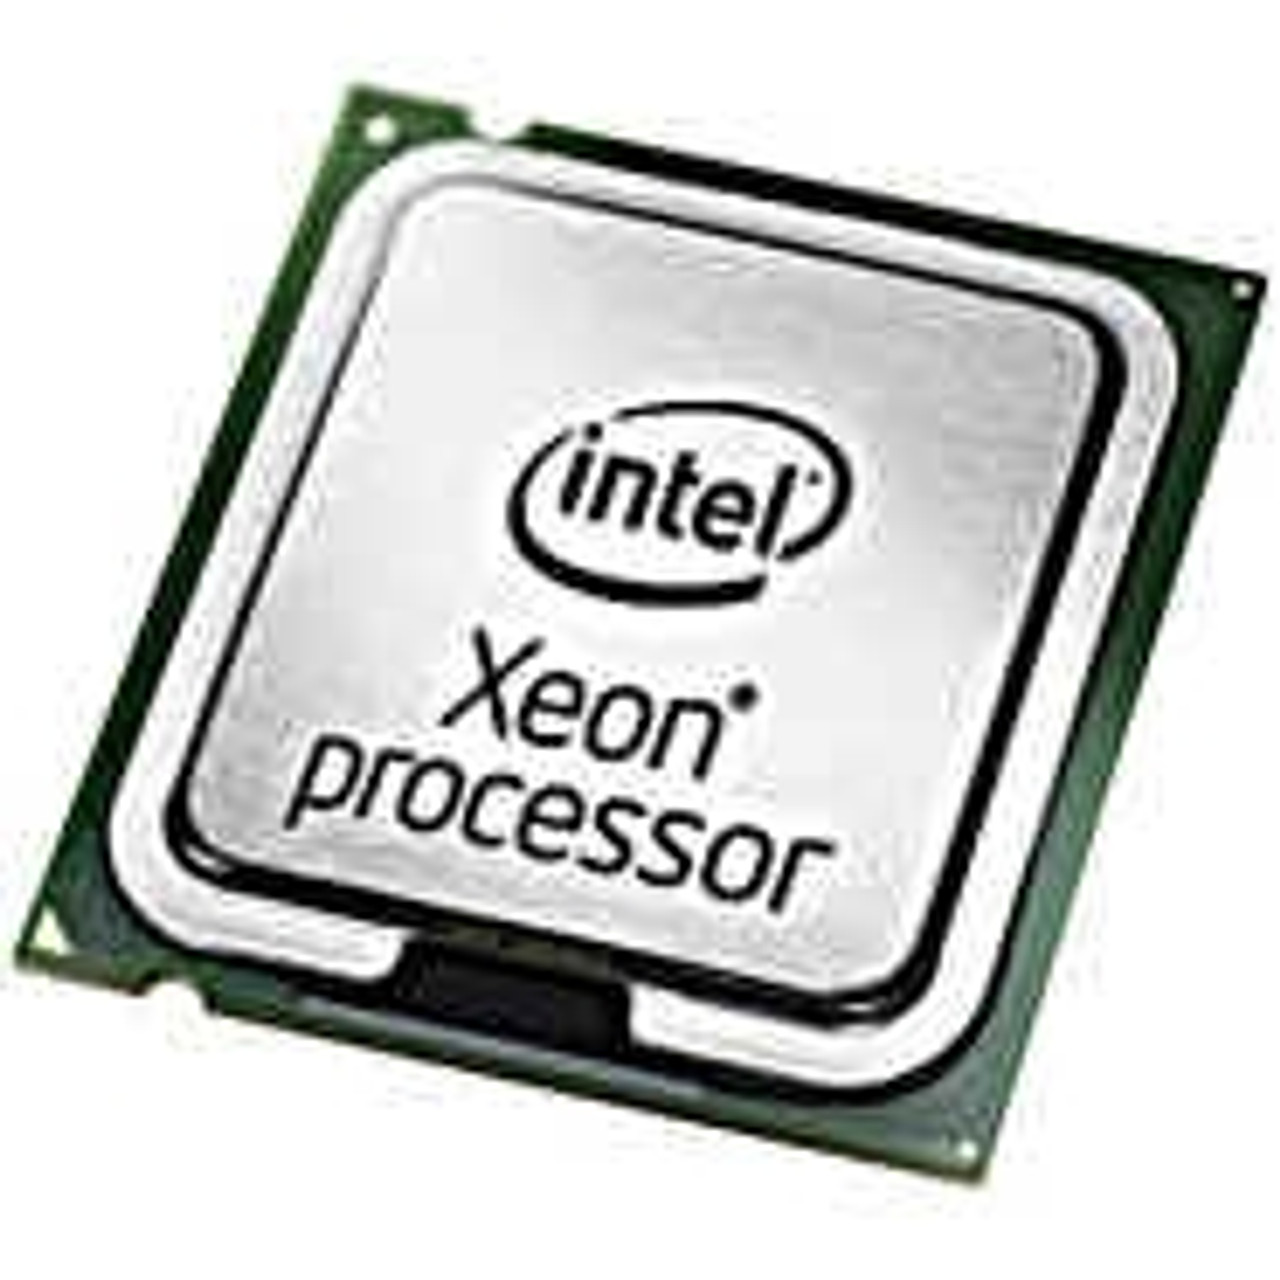 Intel Xeon 5400 Series CPU Processors for Dell PowerEdge